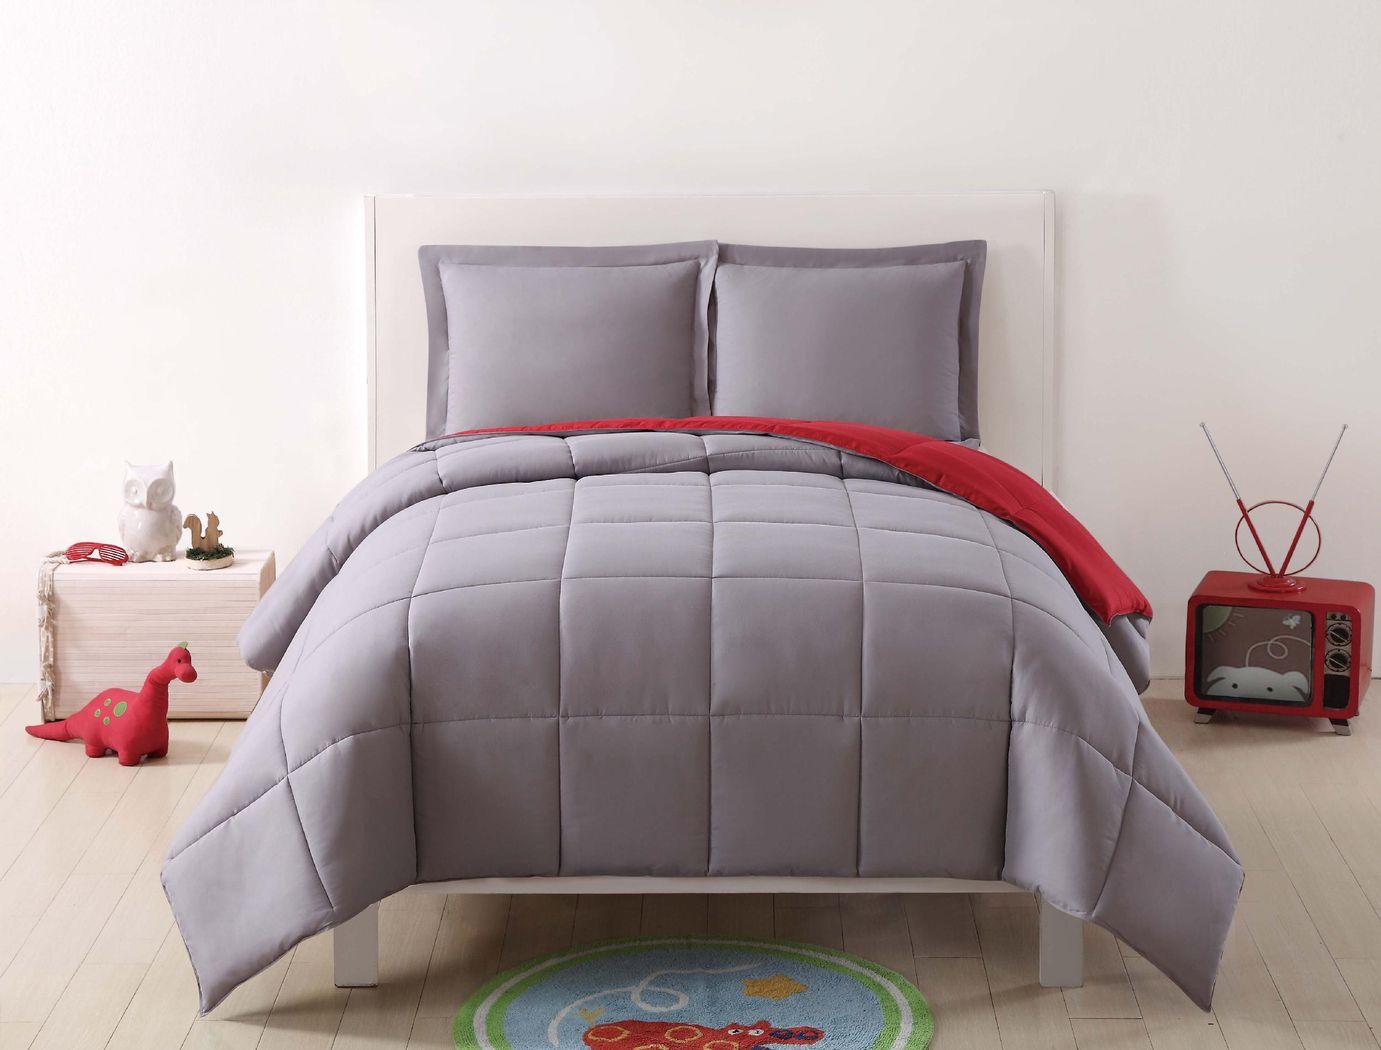 Kids Boyette Gray/Red 2 Pc Twin Comforter Set